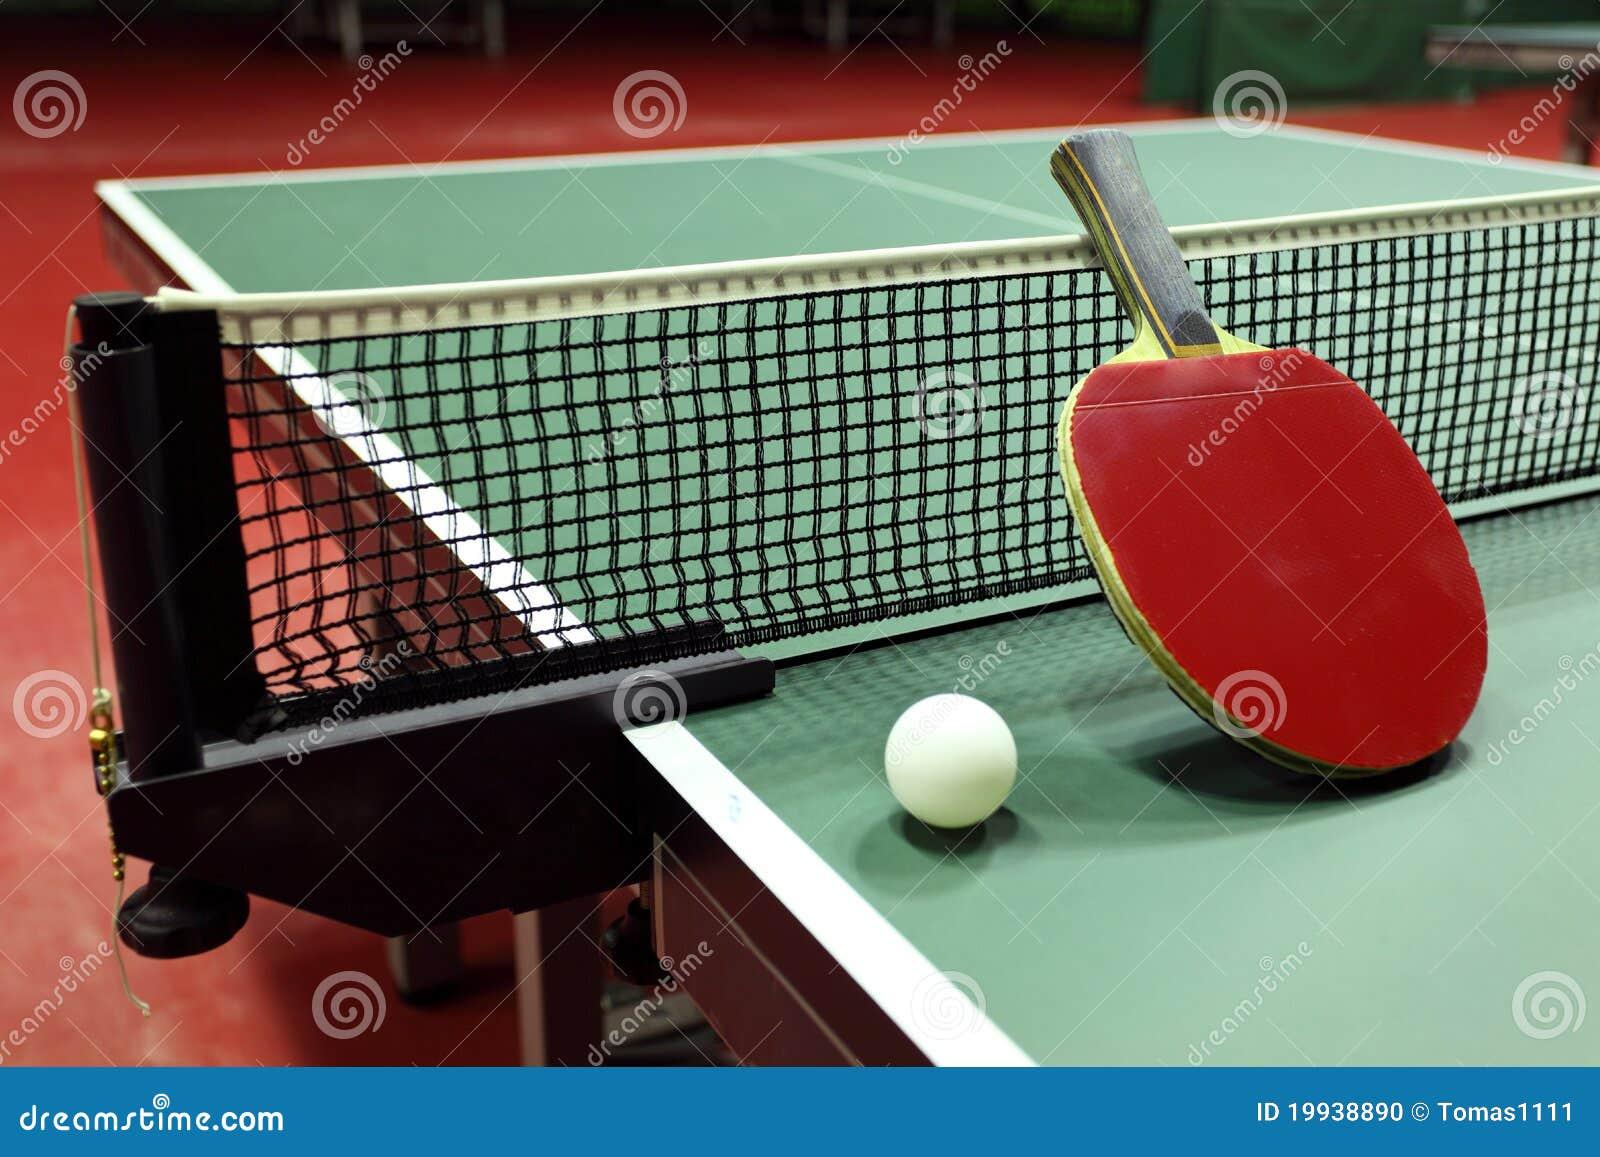 Equipment for table tennis racket ball table stock image 26888437 - Equipment for table tennis ...